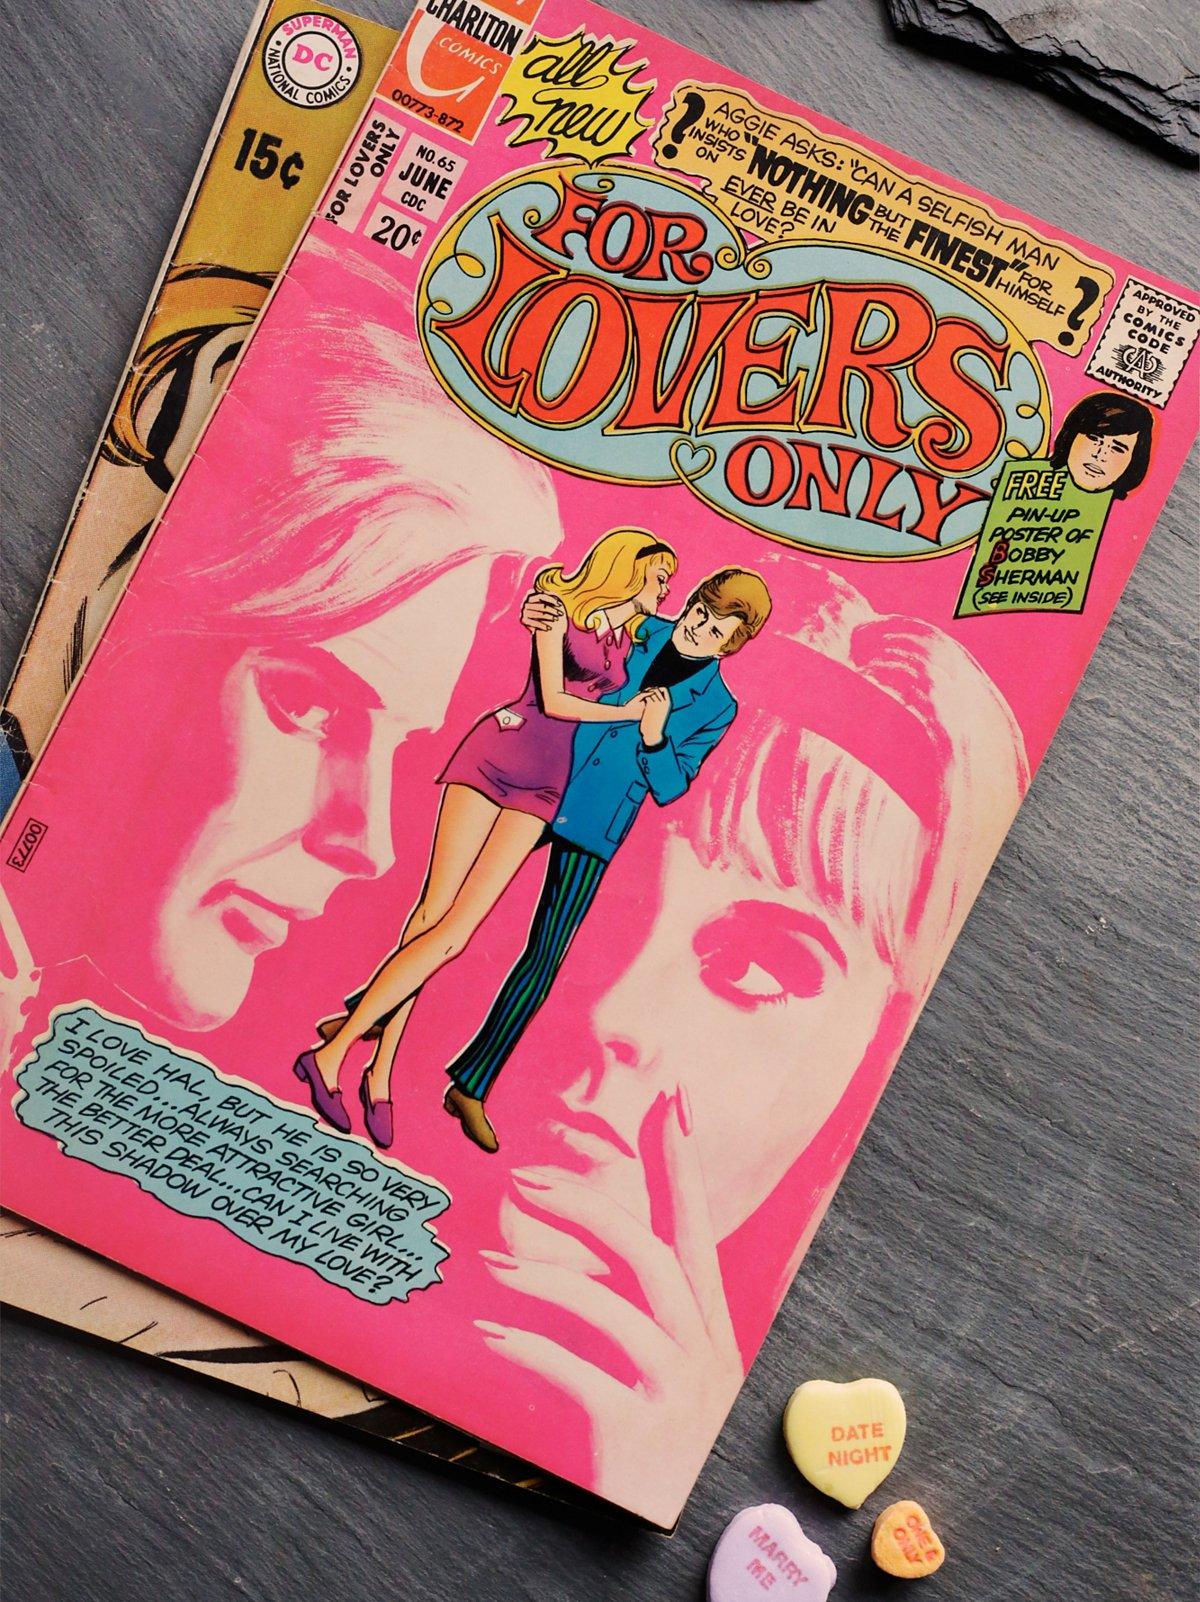 Vintage Romantic Comics